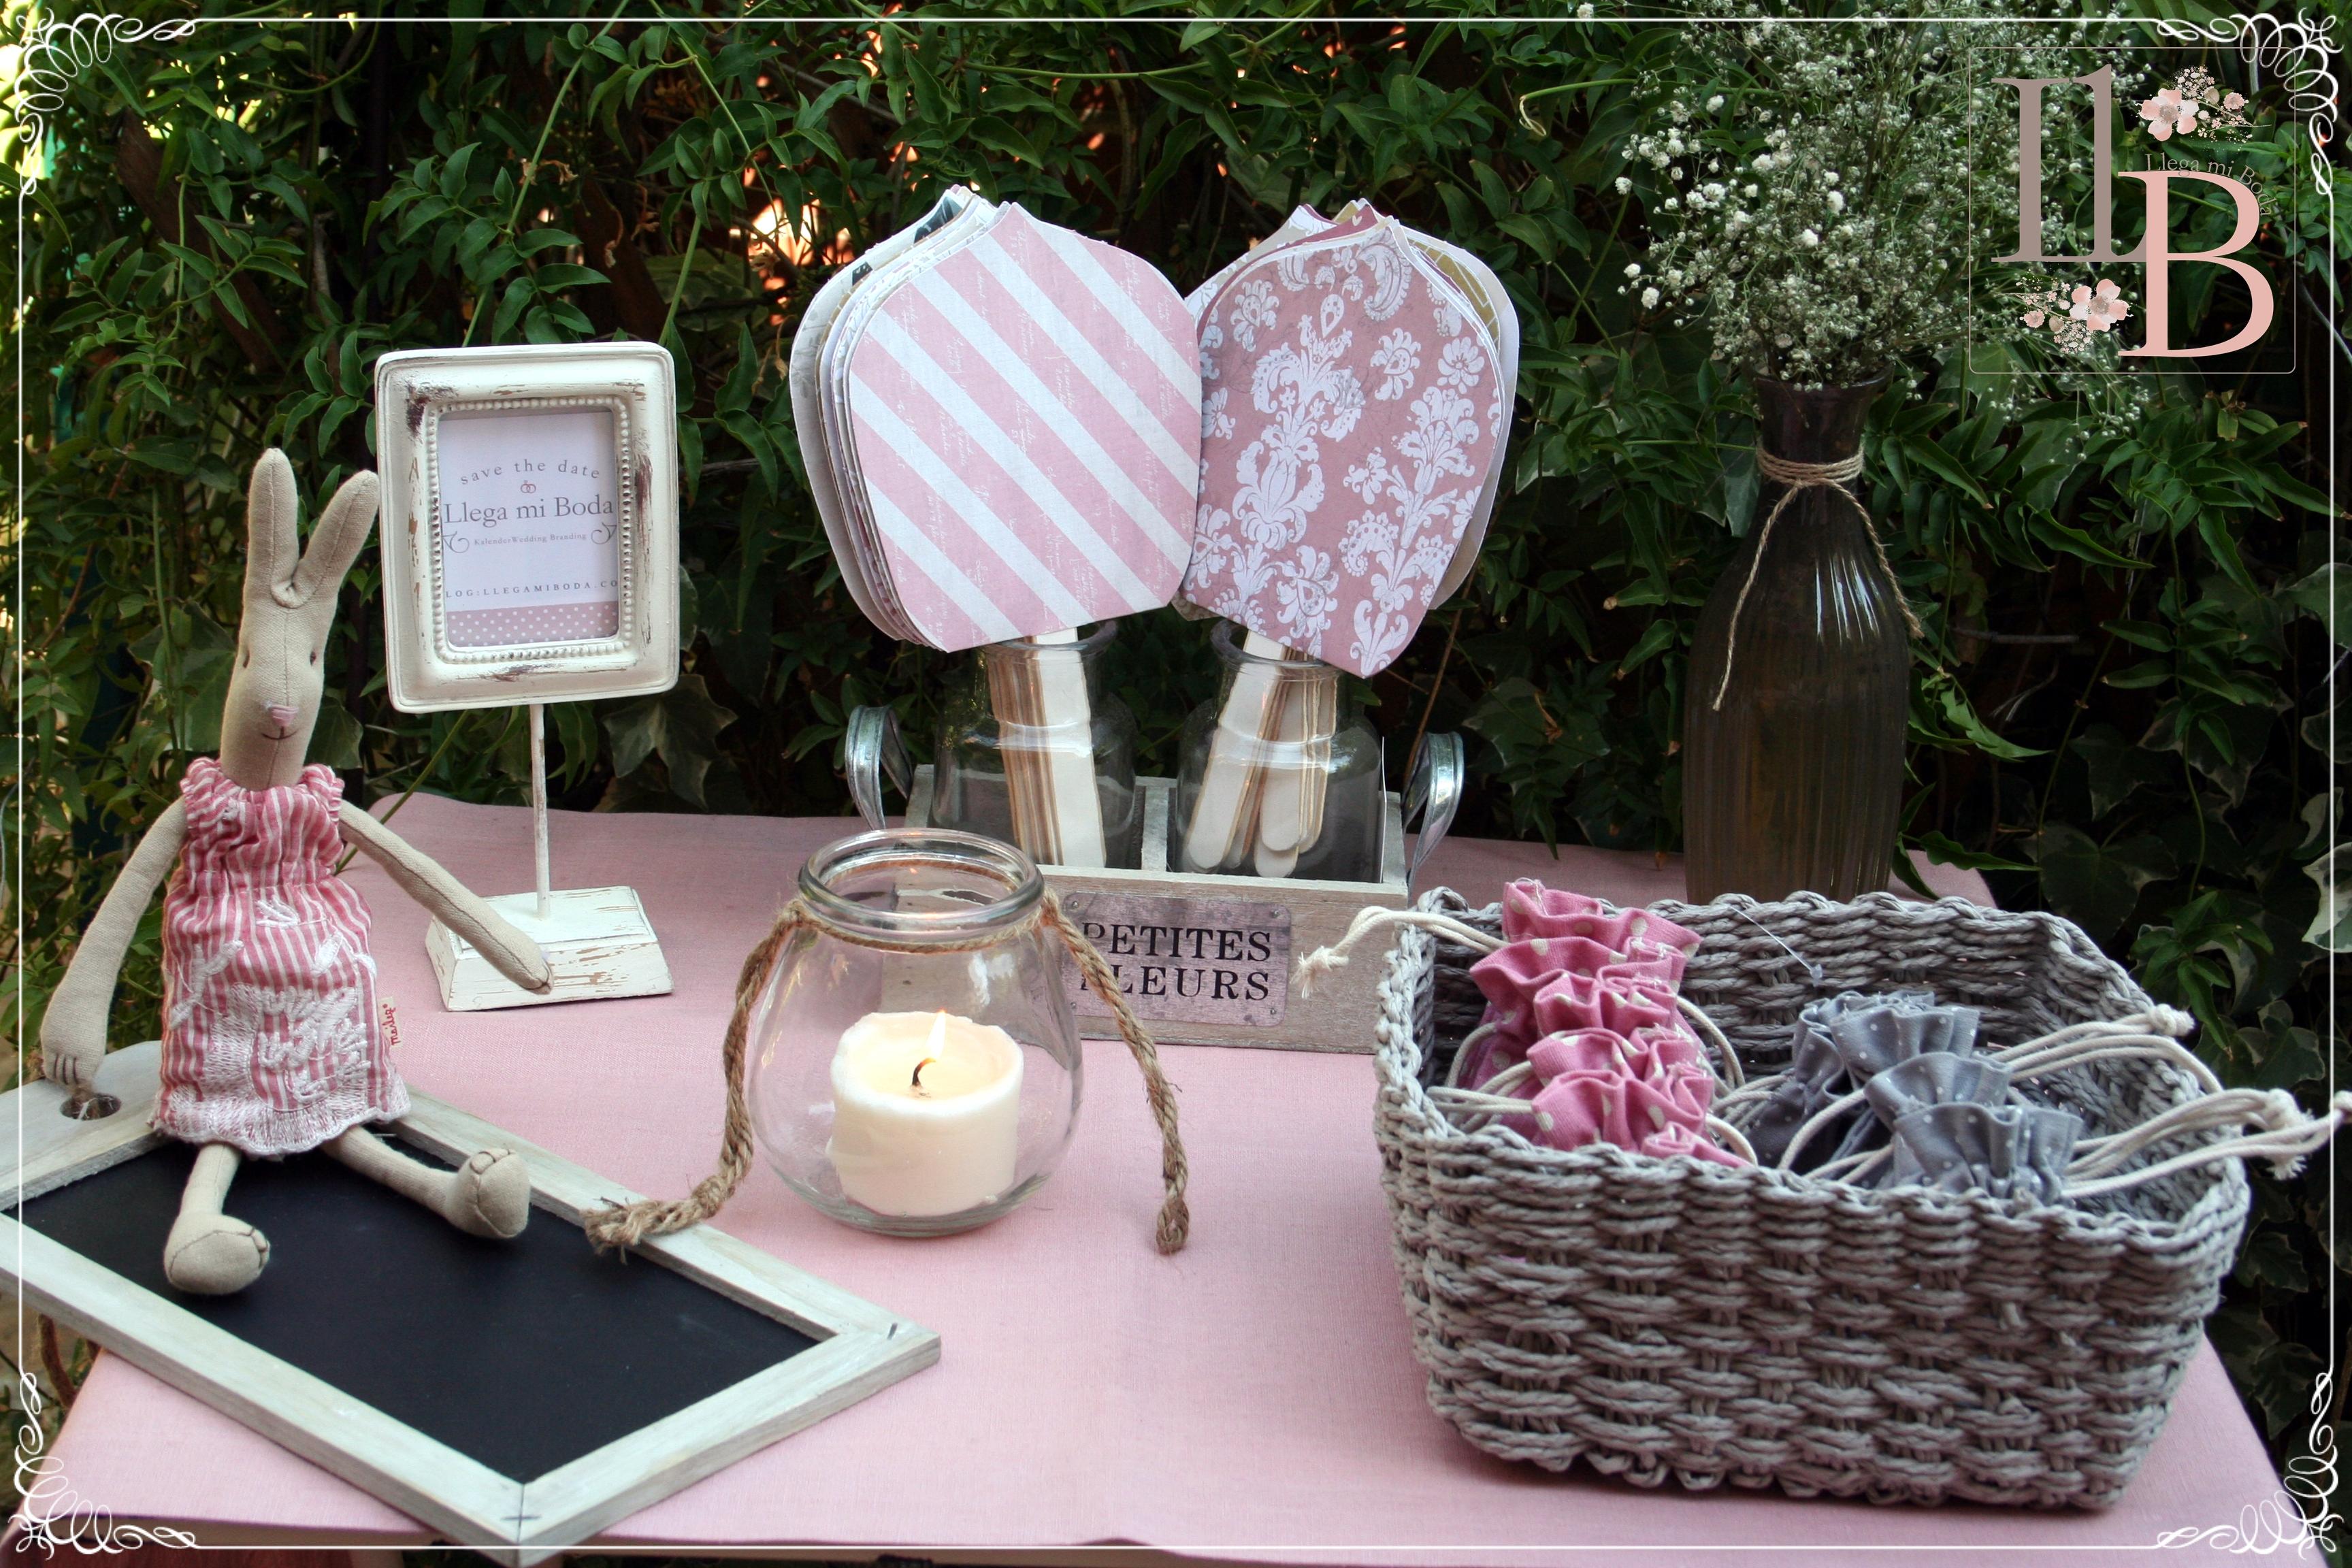 Rinc n para detalles a las invitadas llega mi boda blog for Detalles de decoracion